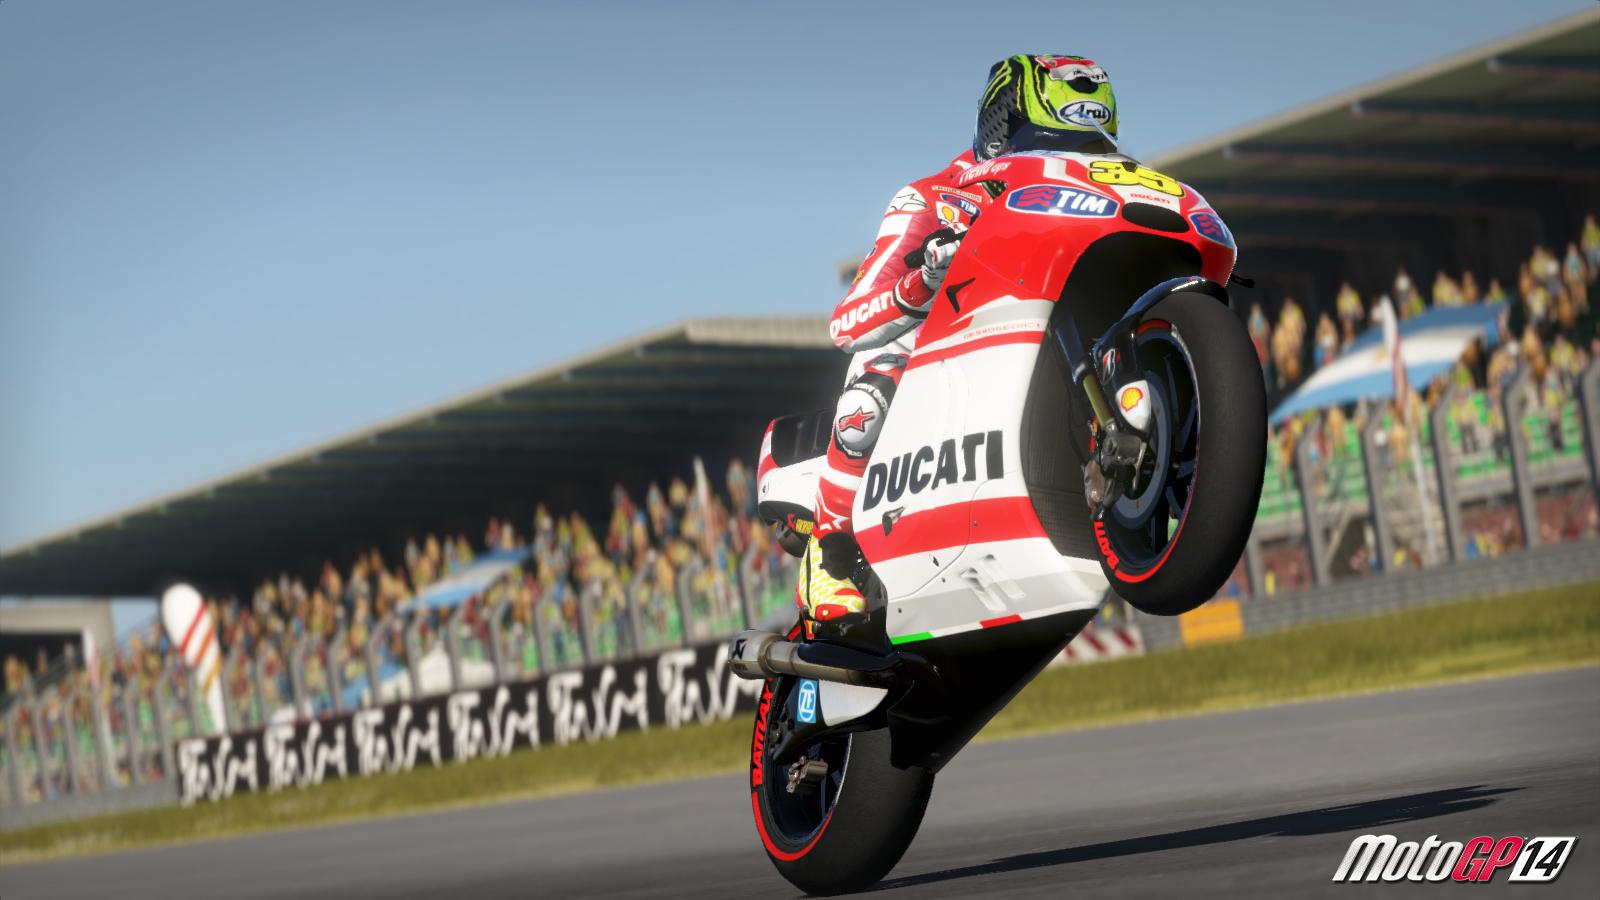 MotoGP 14 Multilenguaje ESPAÑOL XBOX 360 (Región NTSC-U/PAL) 6